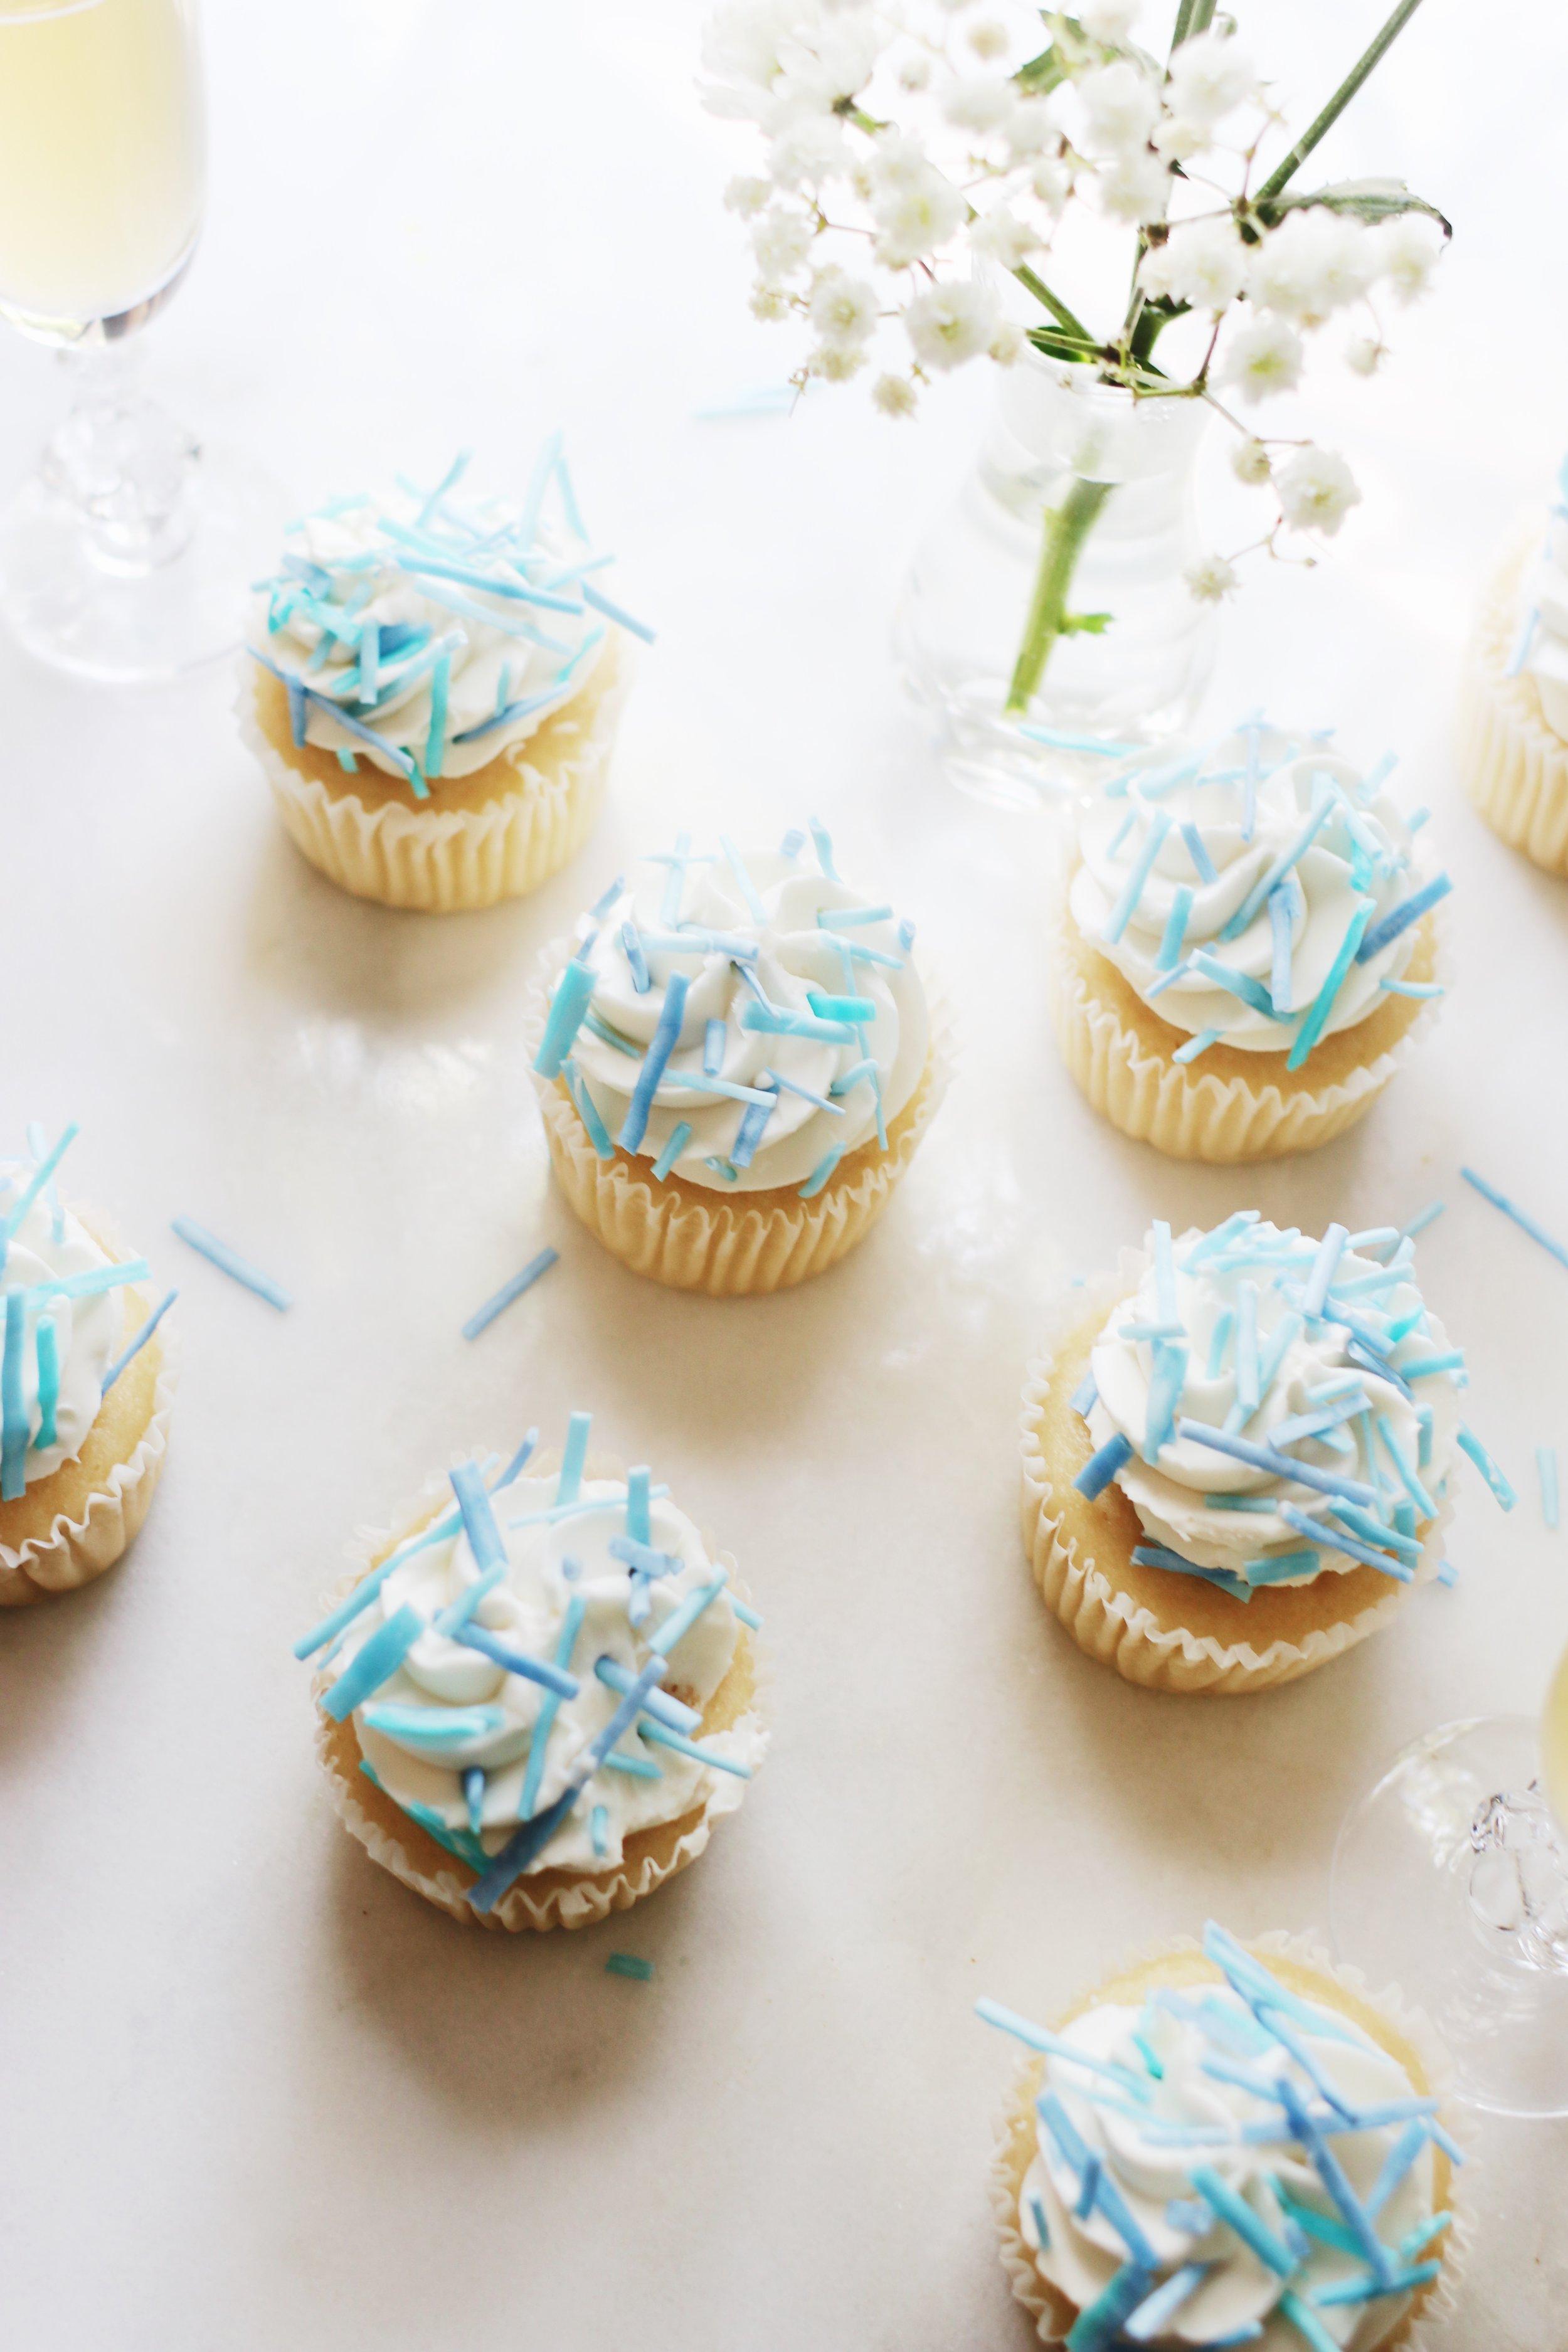 hanukkah-cupcakes-homemade-sprinkles-recipe-40.JPG